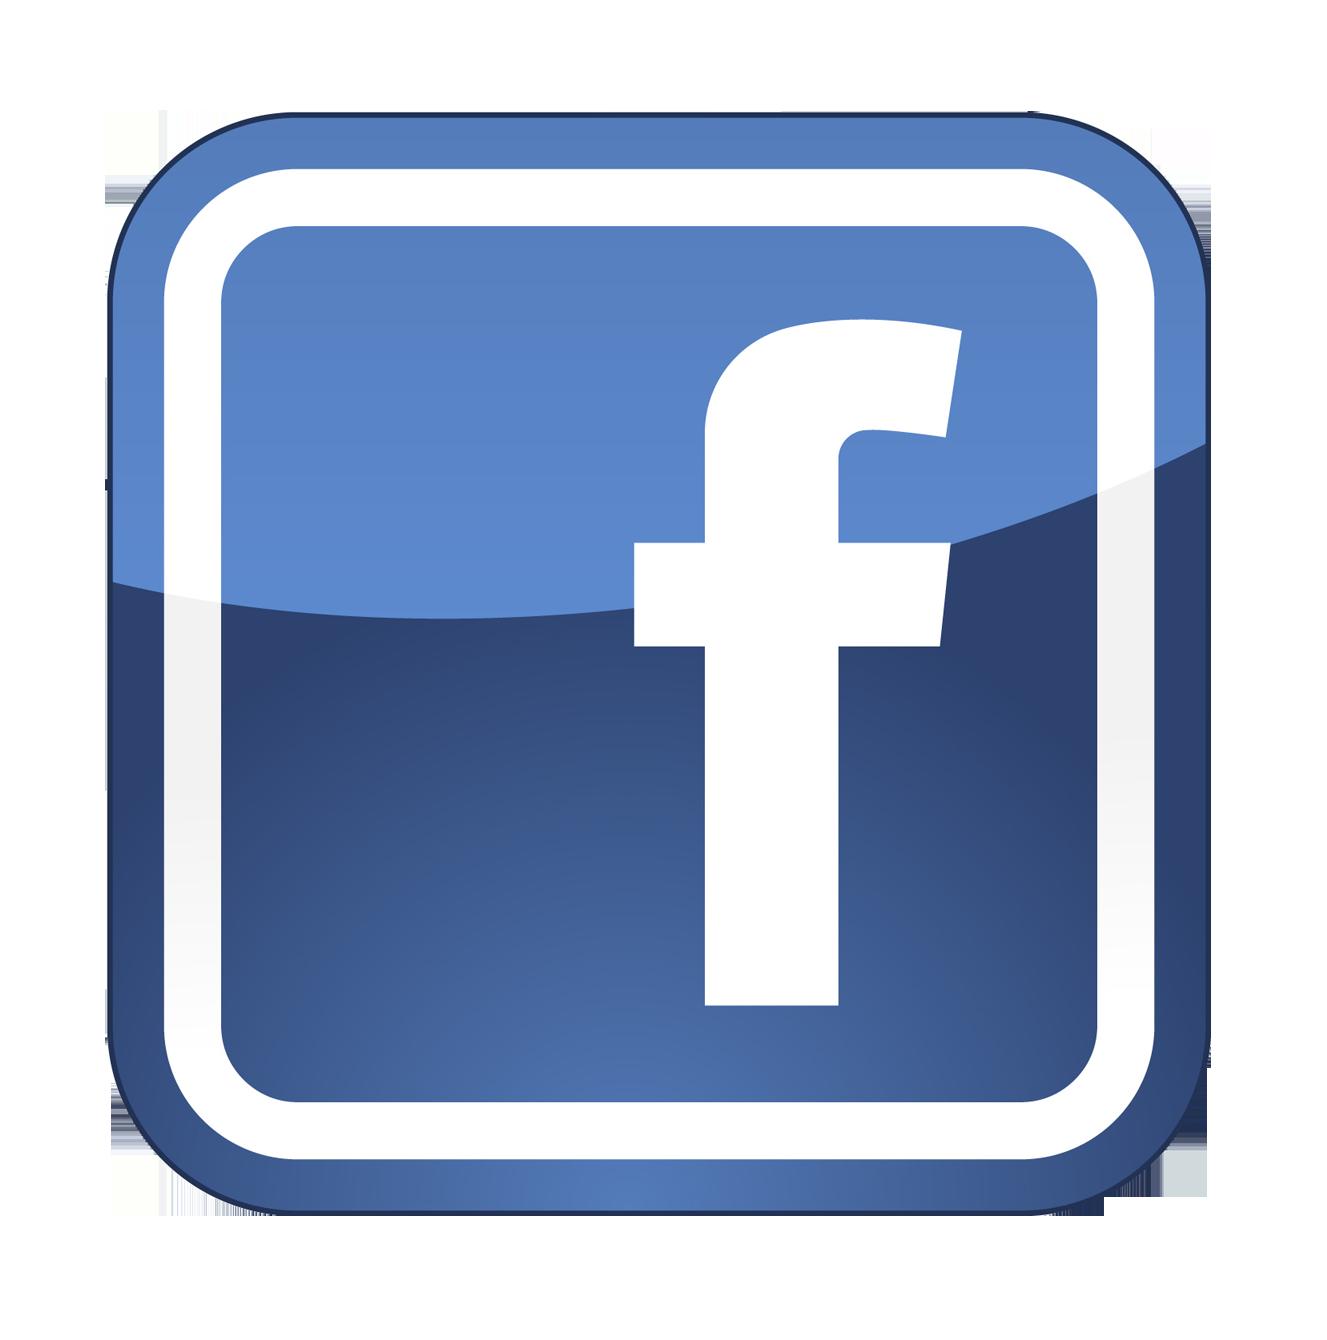 Fb logo icon clipart jpg free download Facebook Computer Icons Social media Clip art - fb png download ... jpg free download